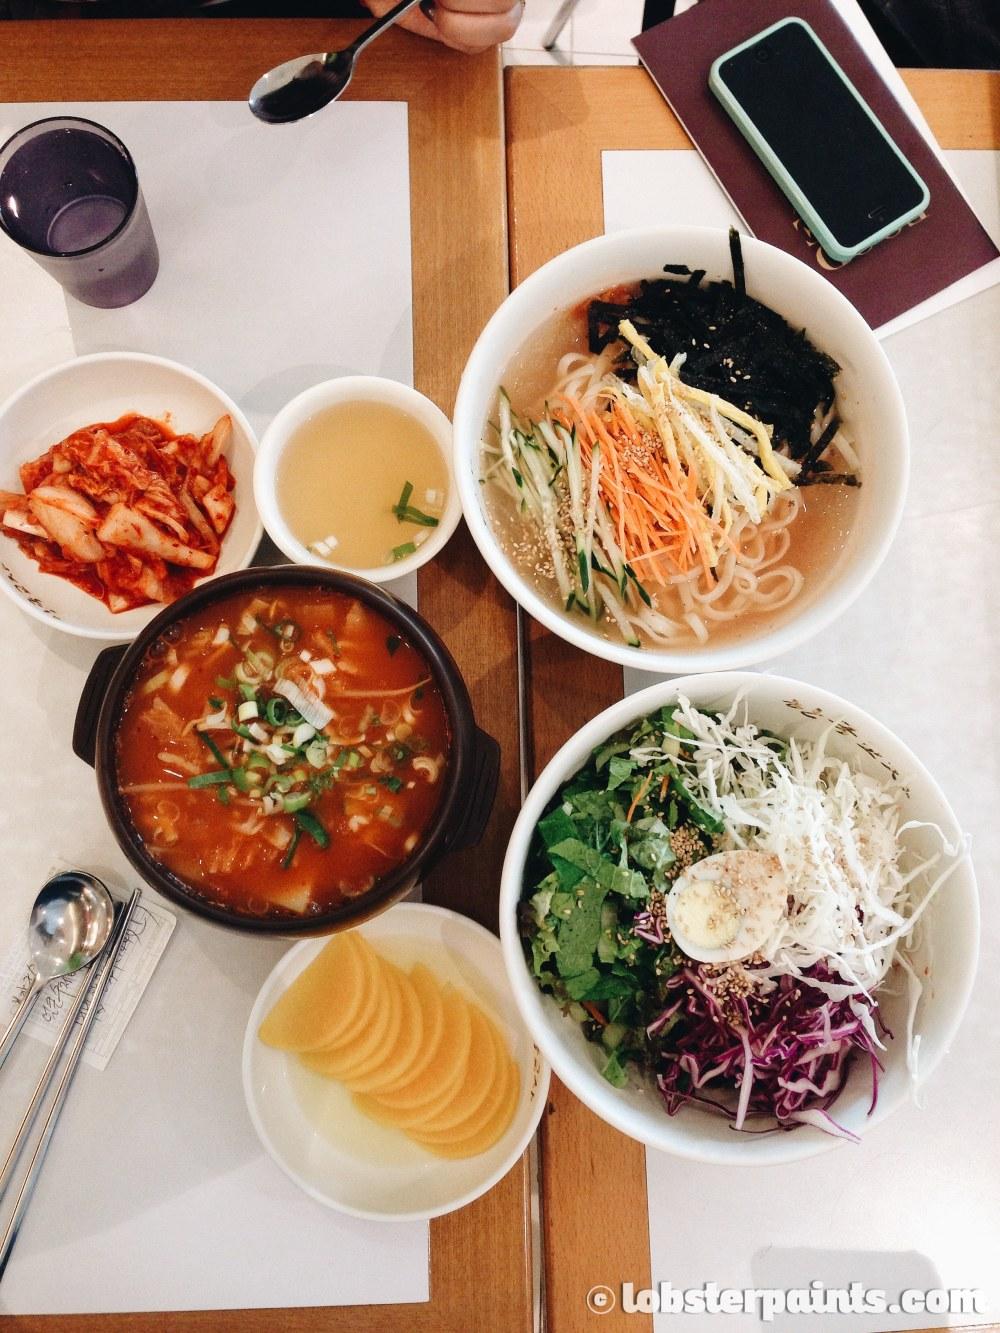 28 Sep 2014: Breakfast @ Shinsegae Centum City | Busan, South Korea